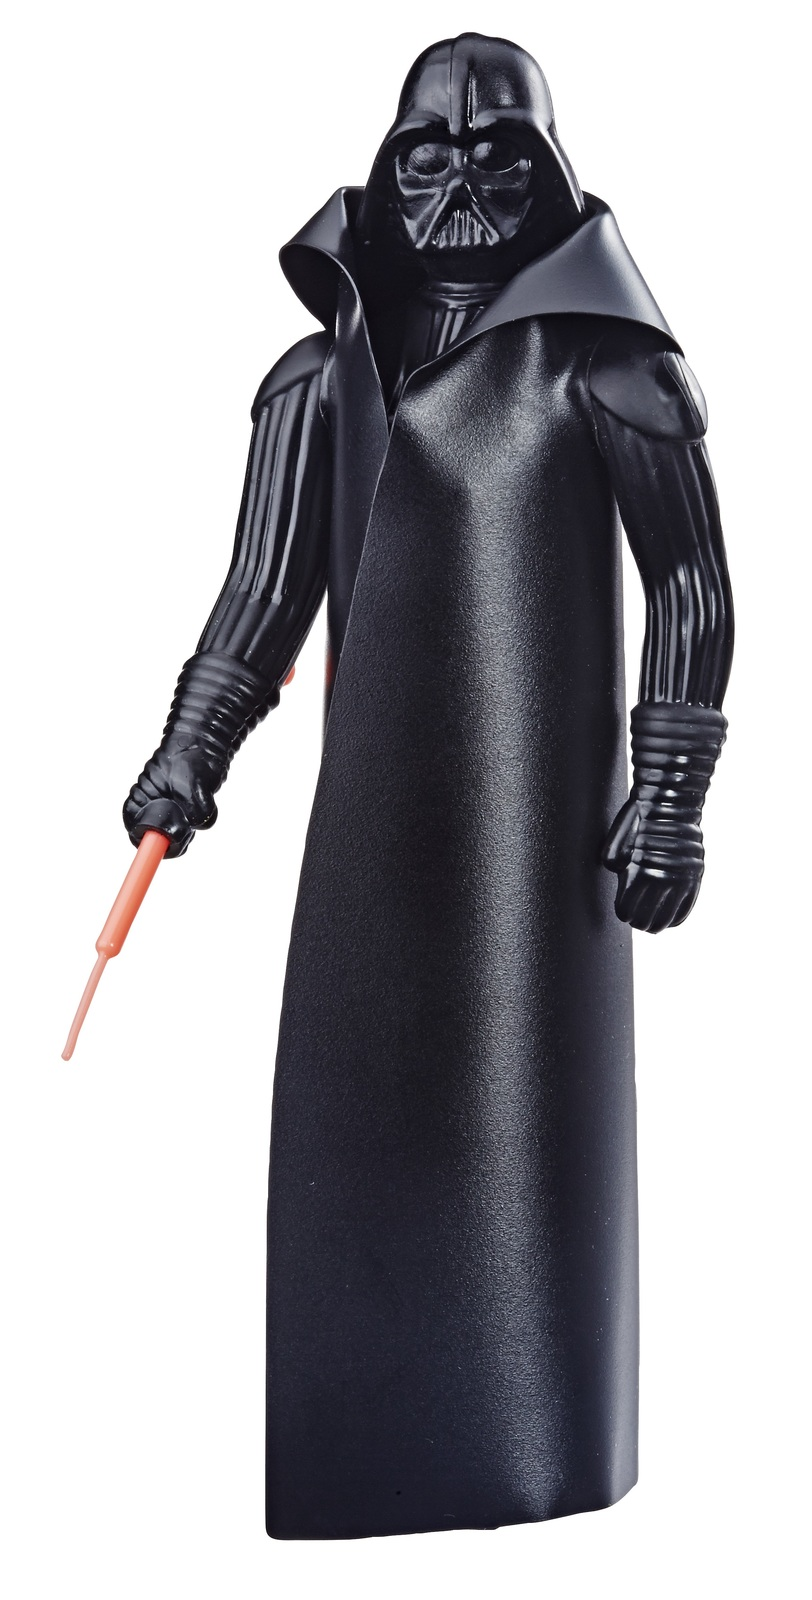 "Star Wars: Darth Vader - 3.75"" Retro Action Figure image"